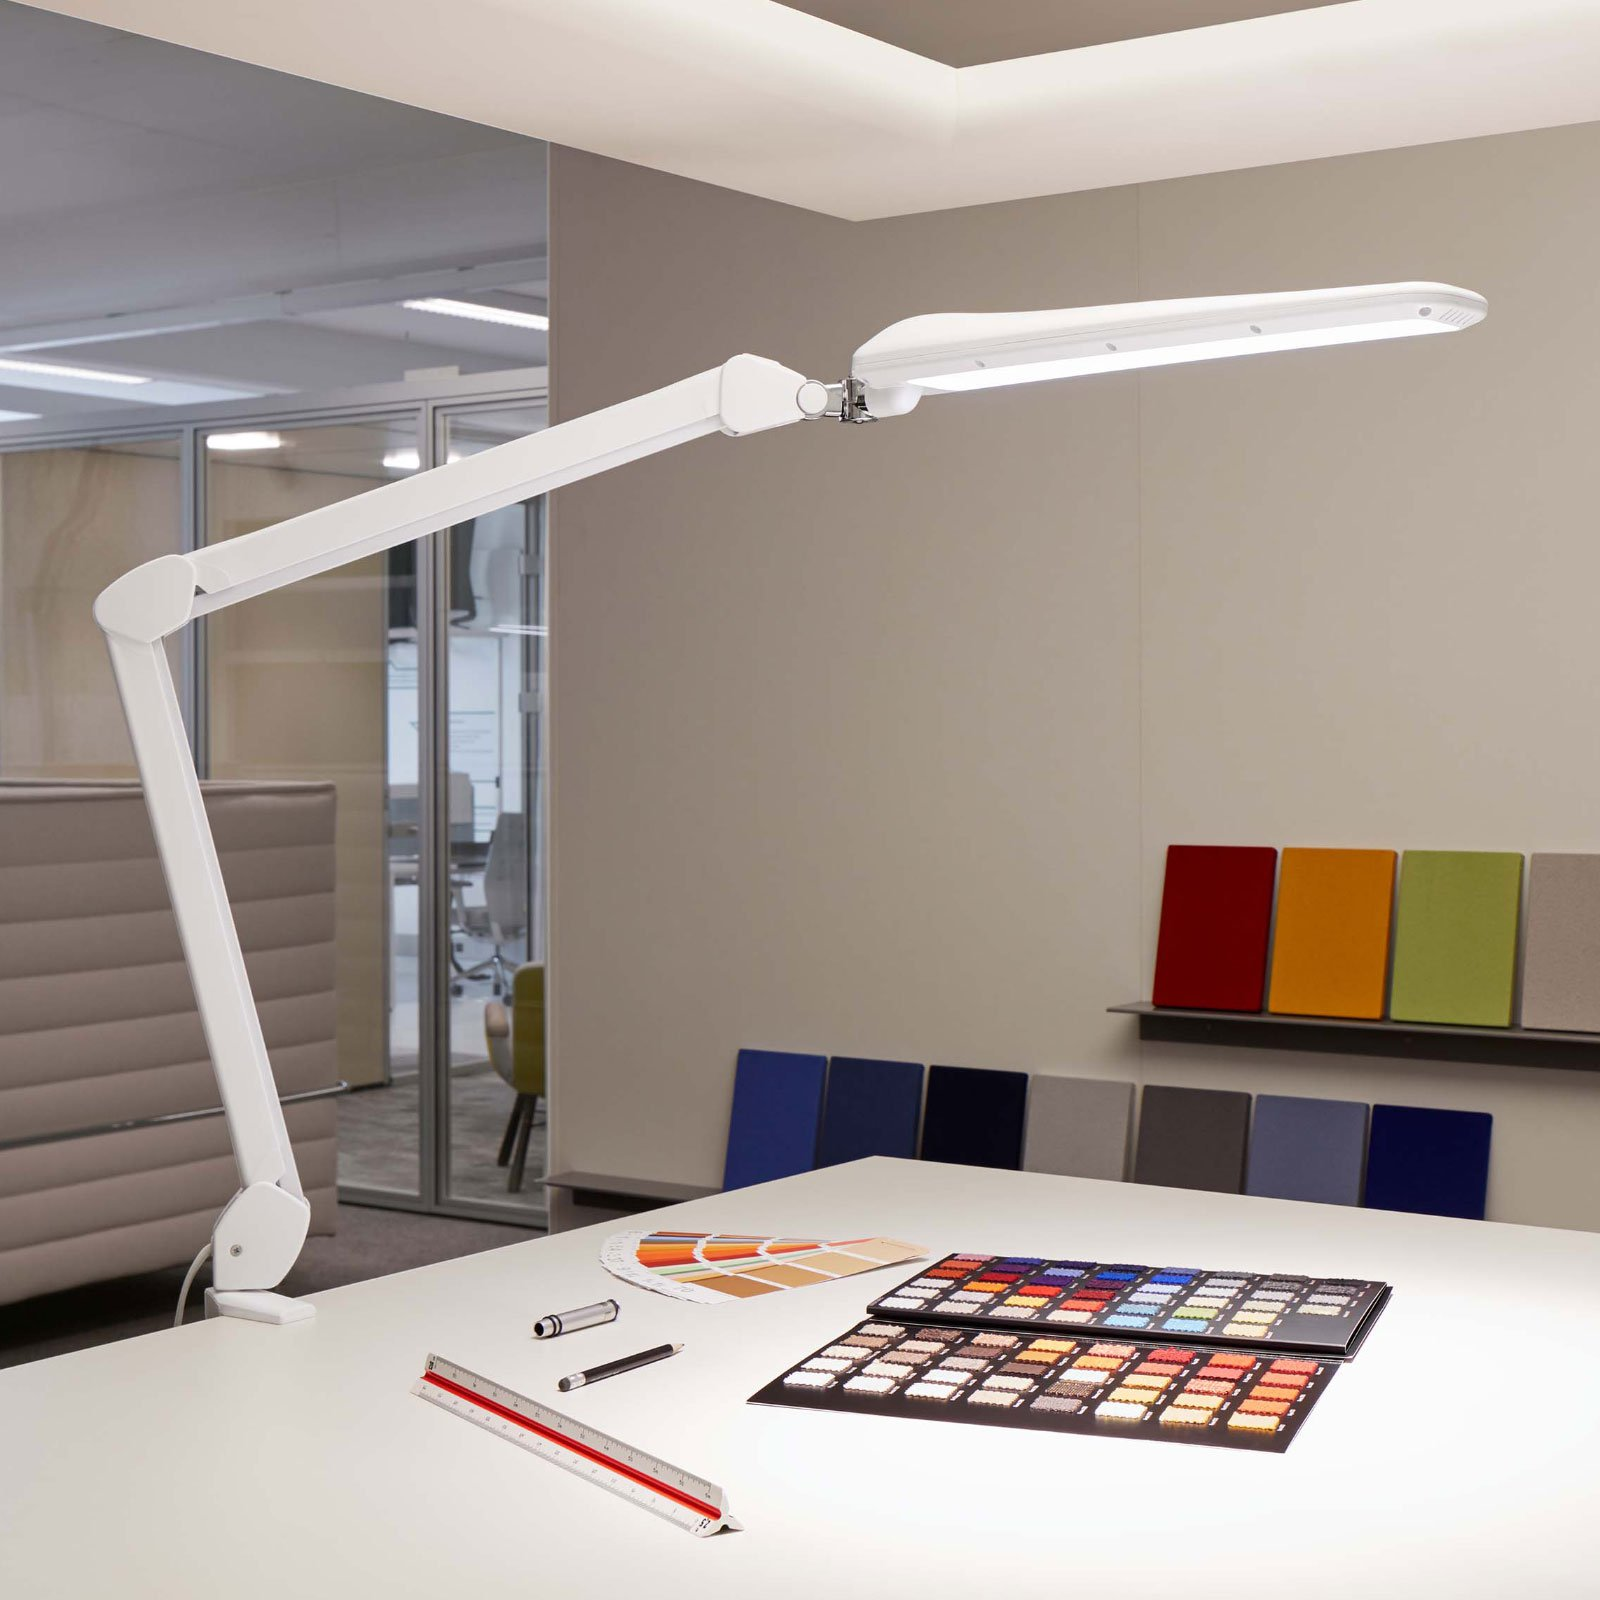 MAULcraft LED-bordlampe med klemfot, dimbar